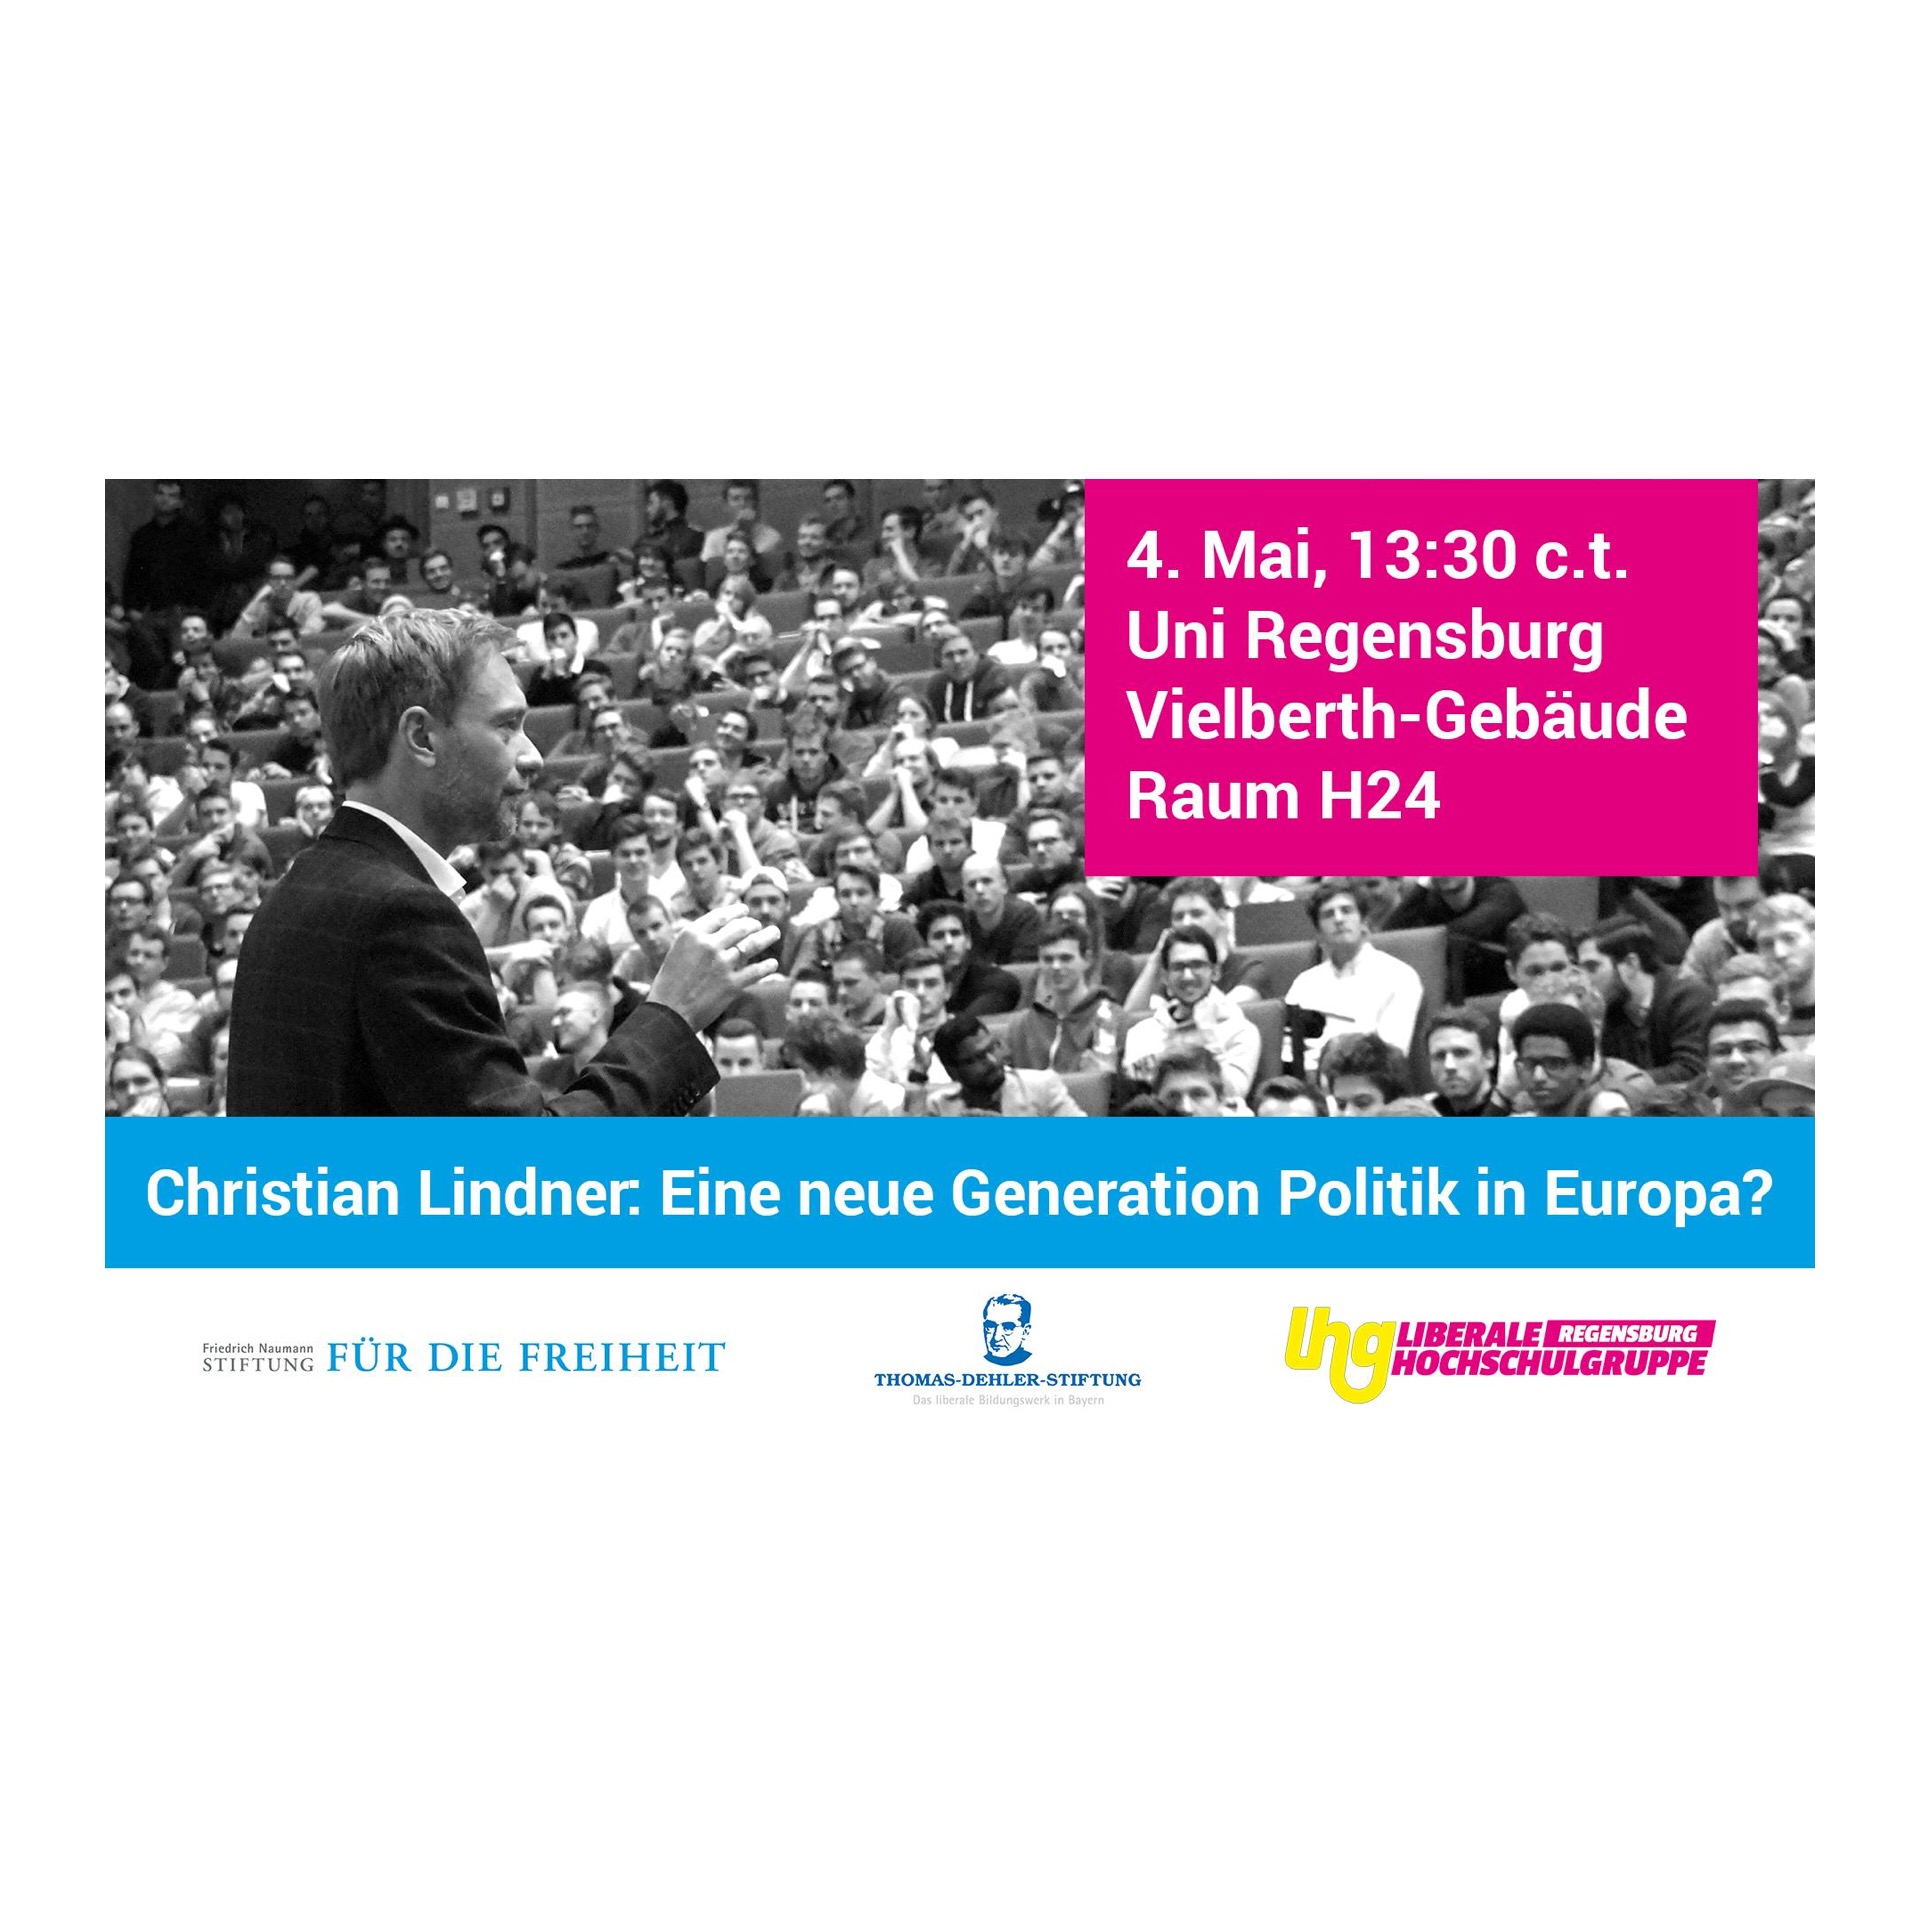 Christian Lindner zu Gast in Regensburg